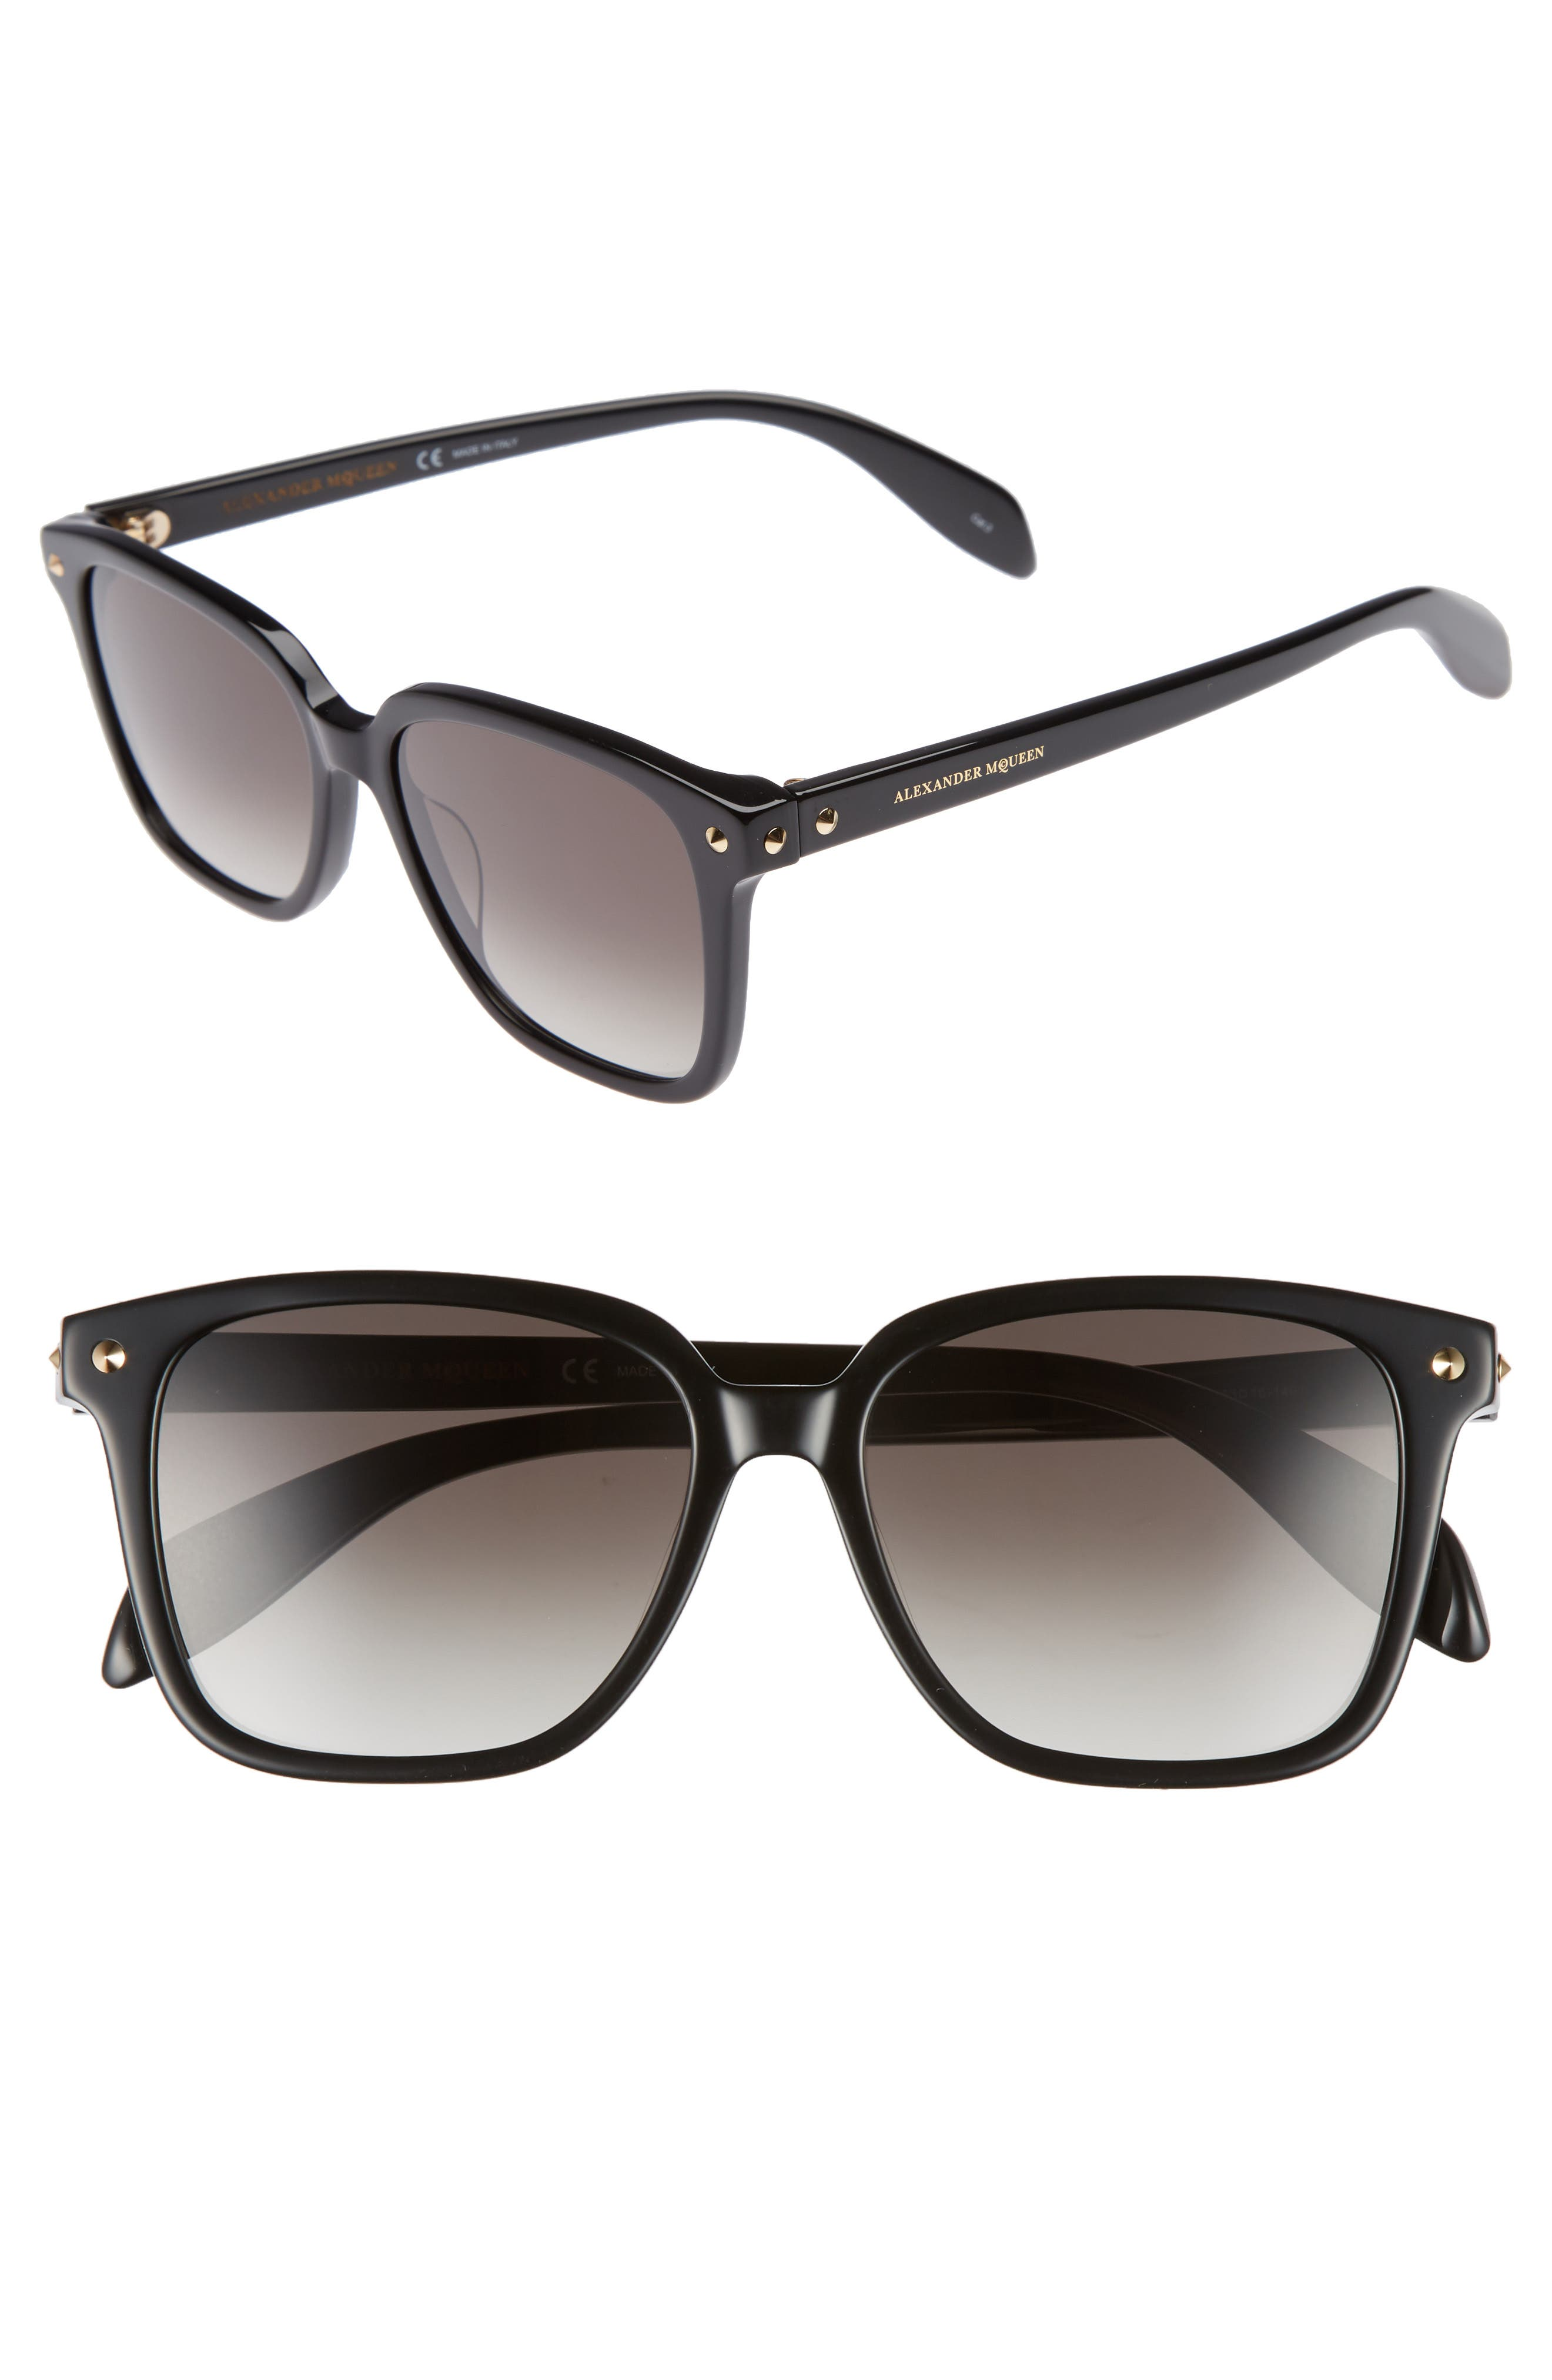 53mm Square Sunglasses,                         Main,                         color, Black